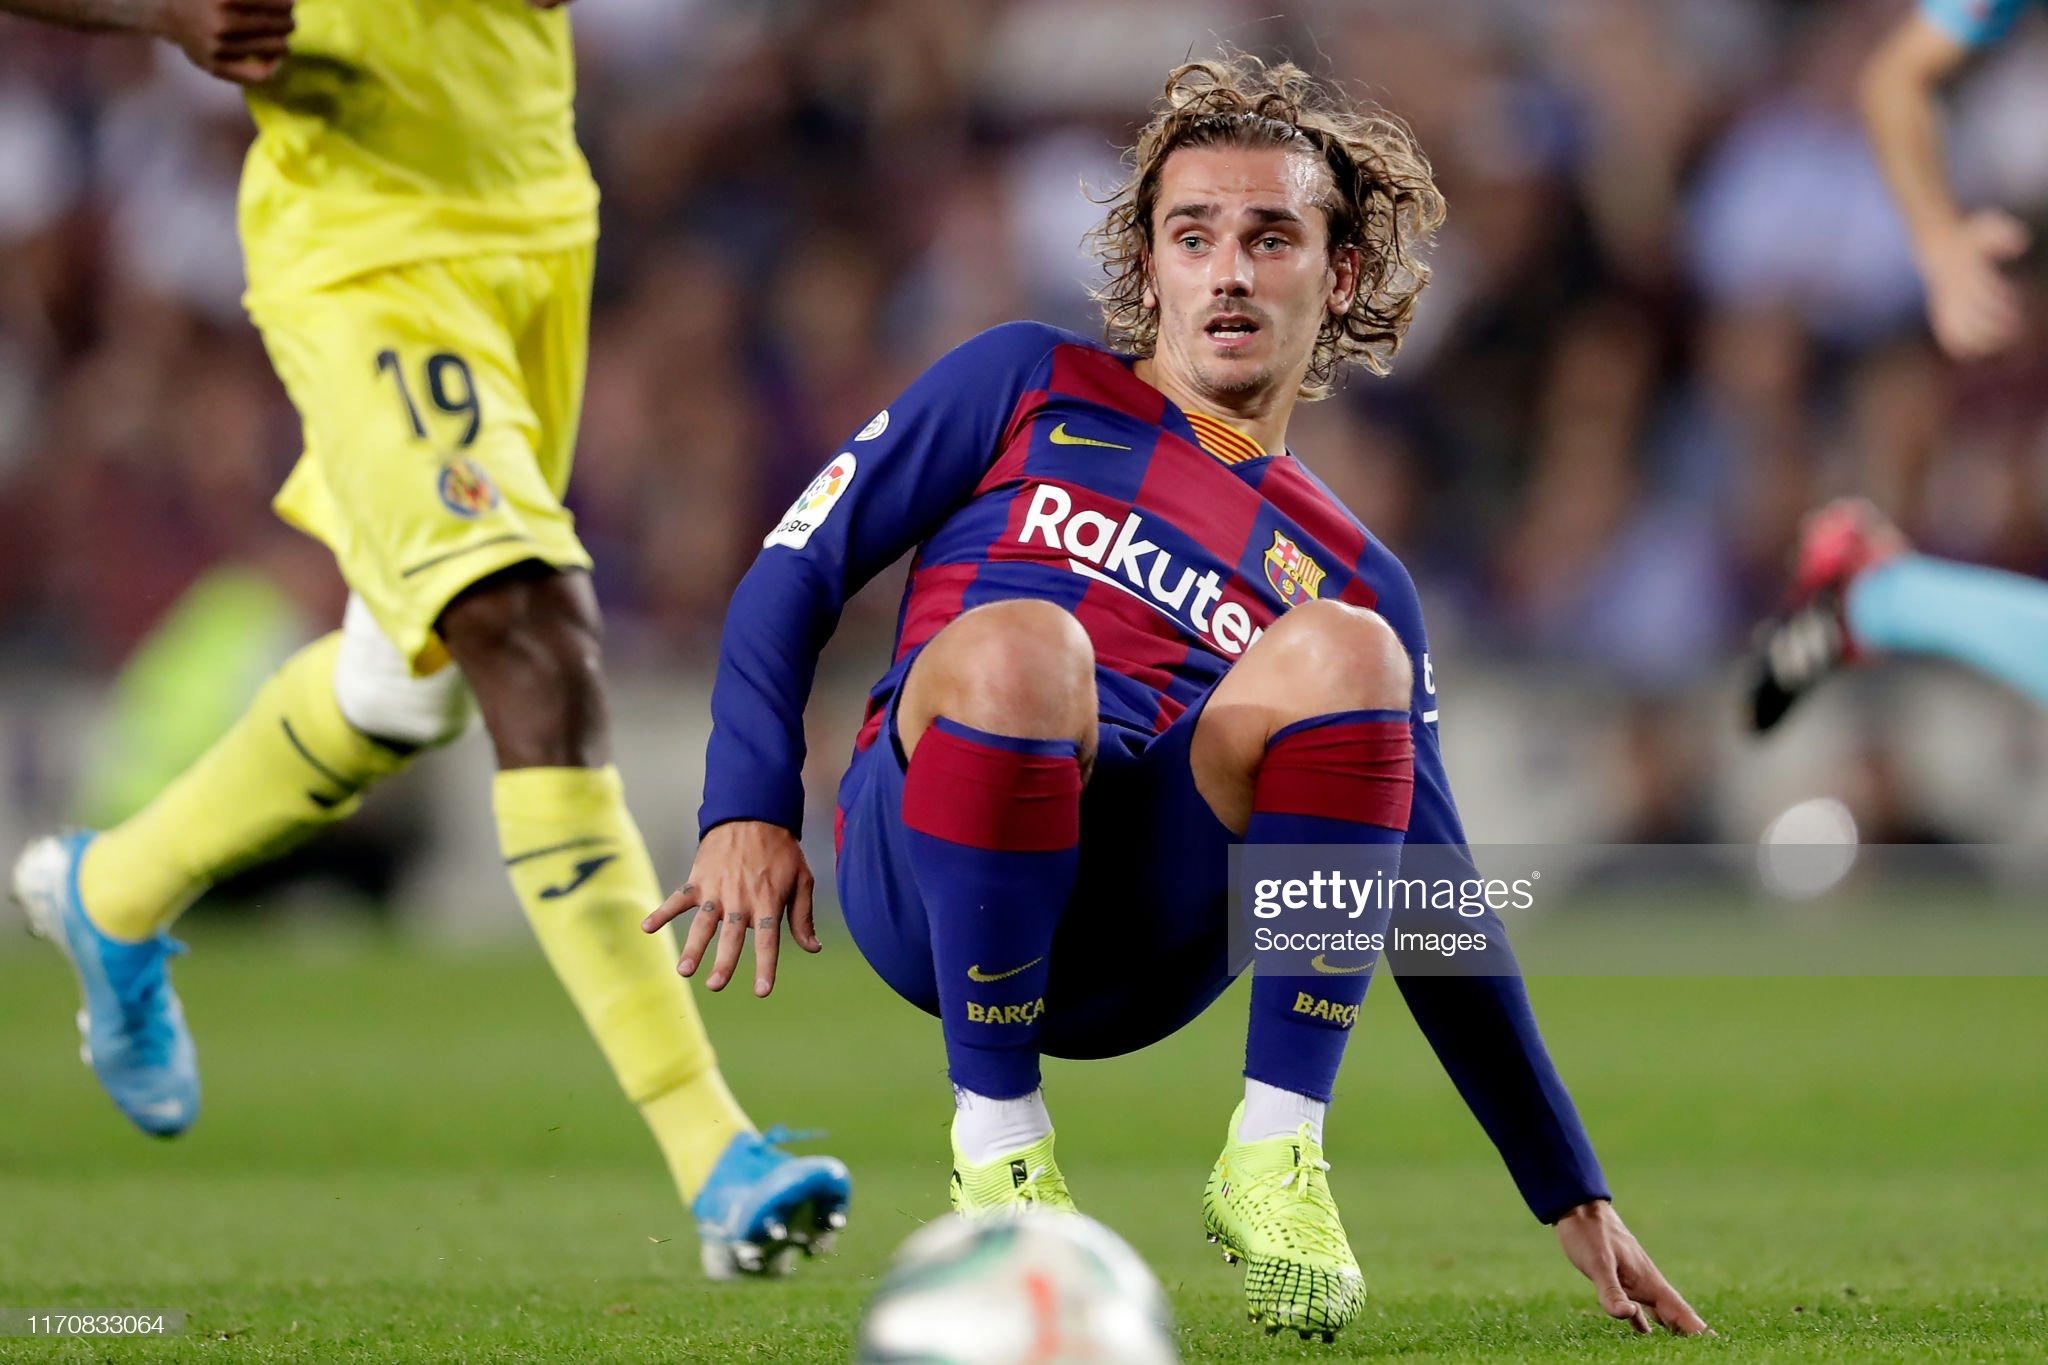 صور مباراة : برشلونة - فياريال 2-1 ( 24-09-2019 )  Antoine-griezmann-of-fc-barcelona-during-the-la-liga-santander-match-picture-id1170833064?s=2048x2048